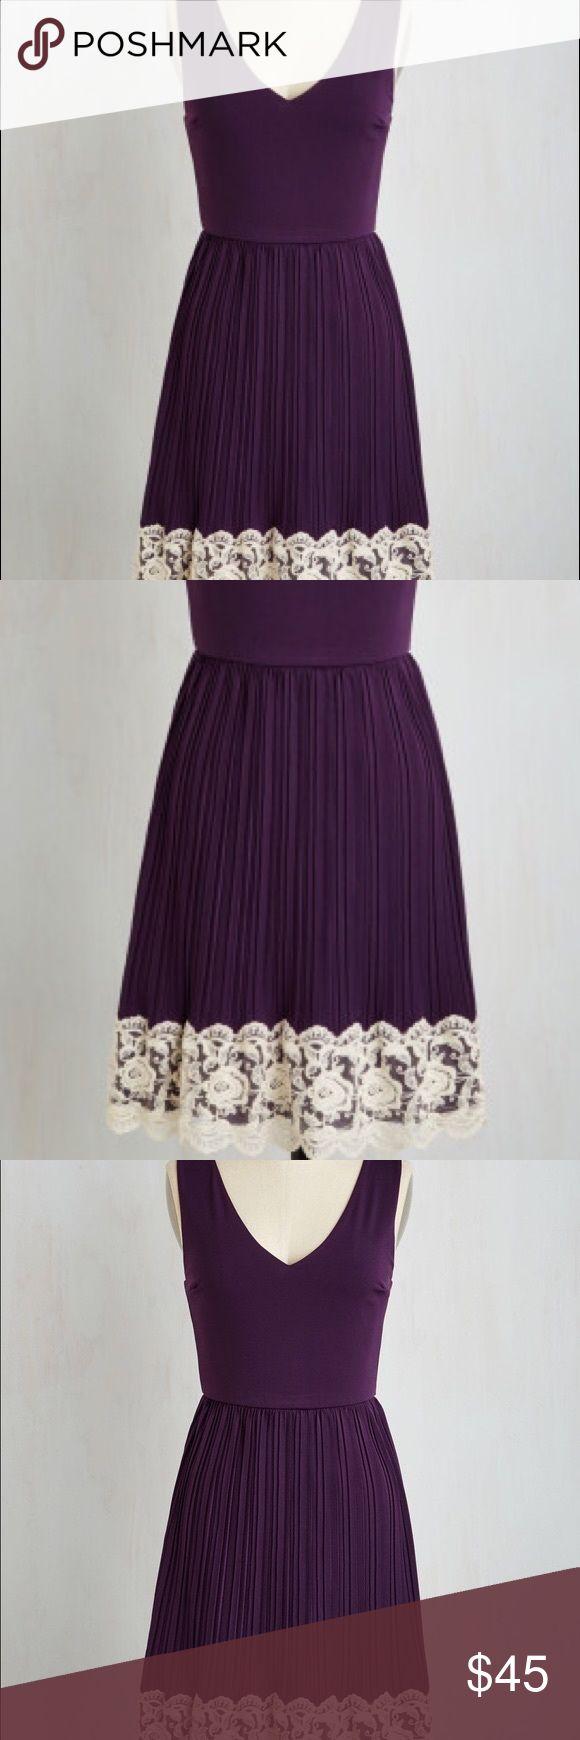 Personal Essayist dress by Modcloth Purple with tan lace sz. S yellow star by Modcloth nwot ModCloth Dresses Midi